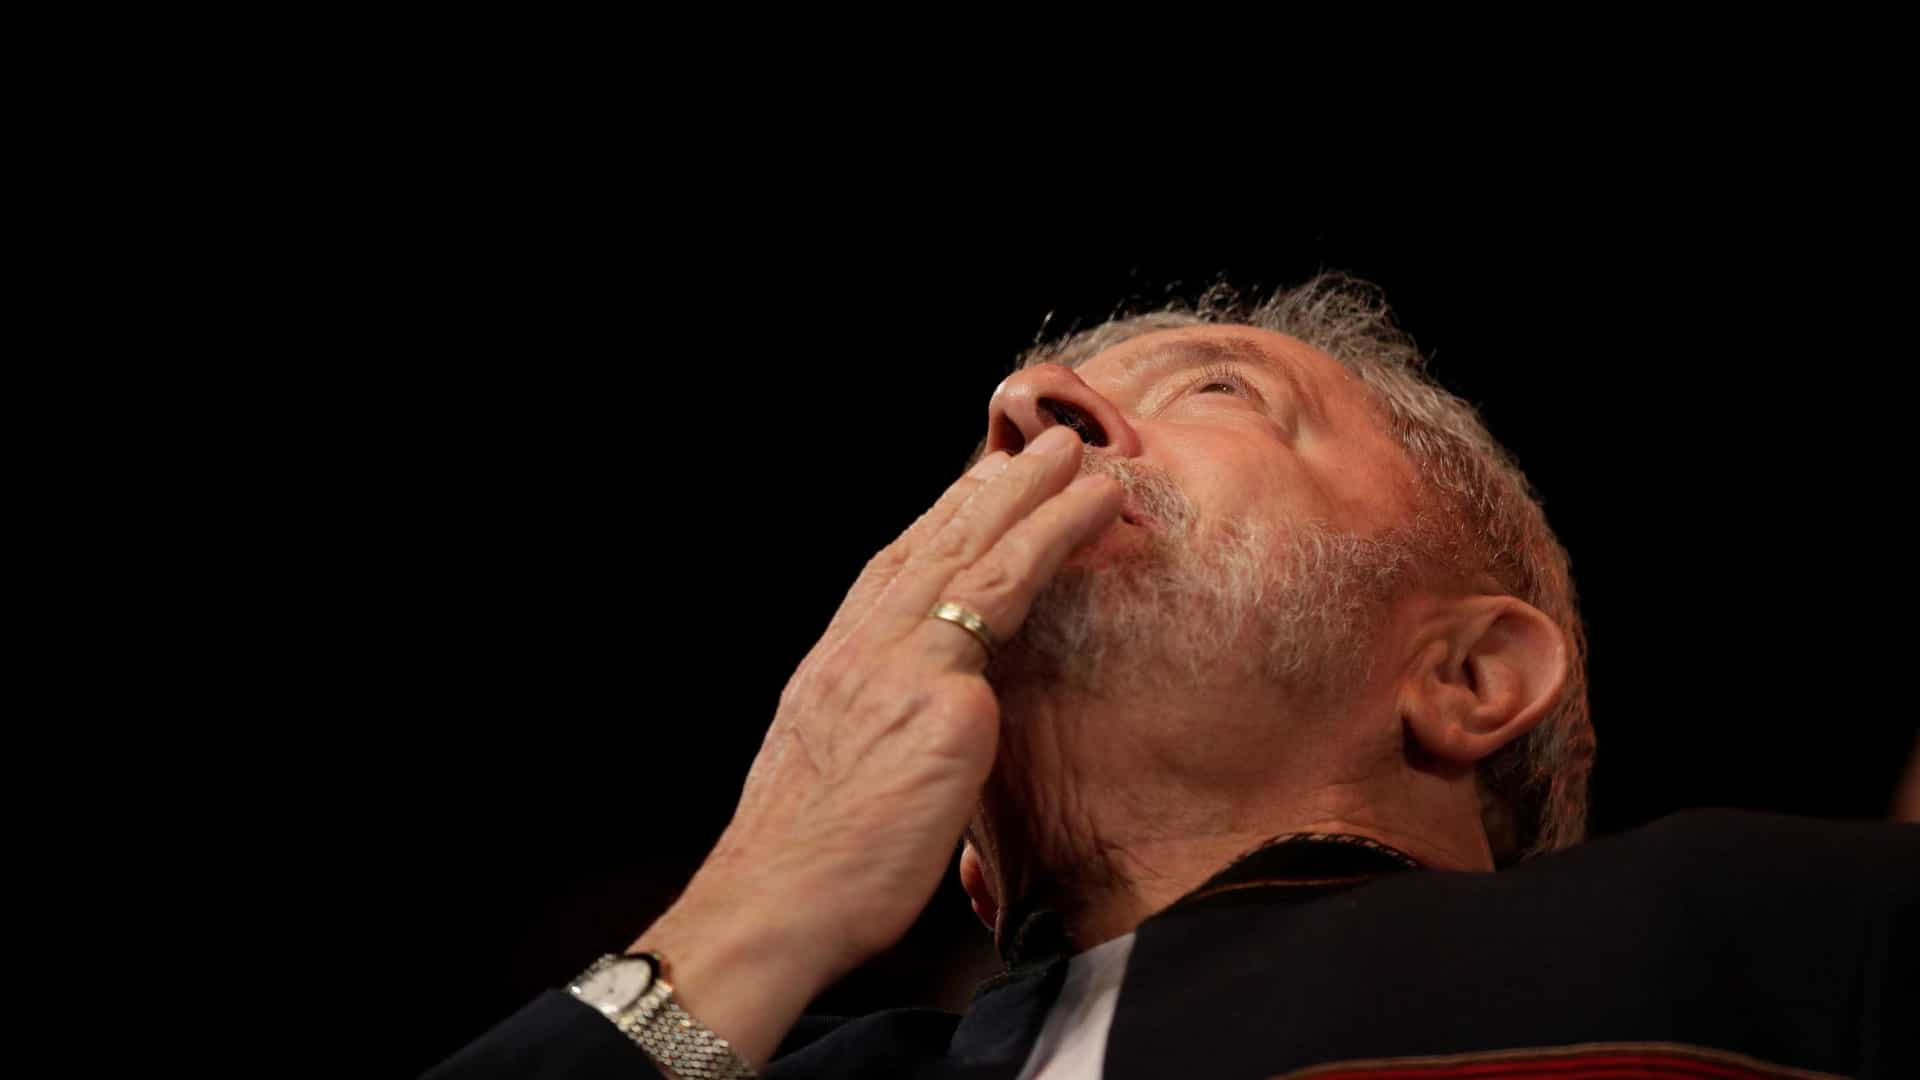 Moro nega pedido de Lula para suspender perícia de sistema da Odebrecht